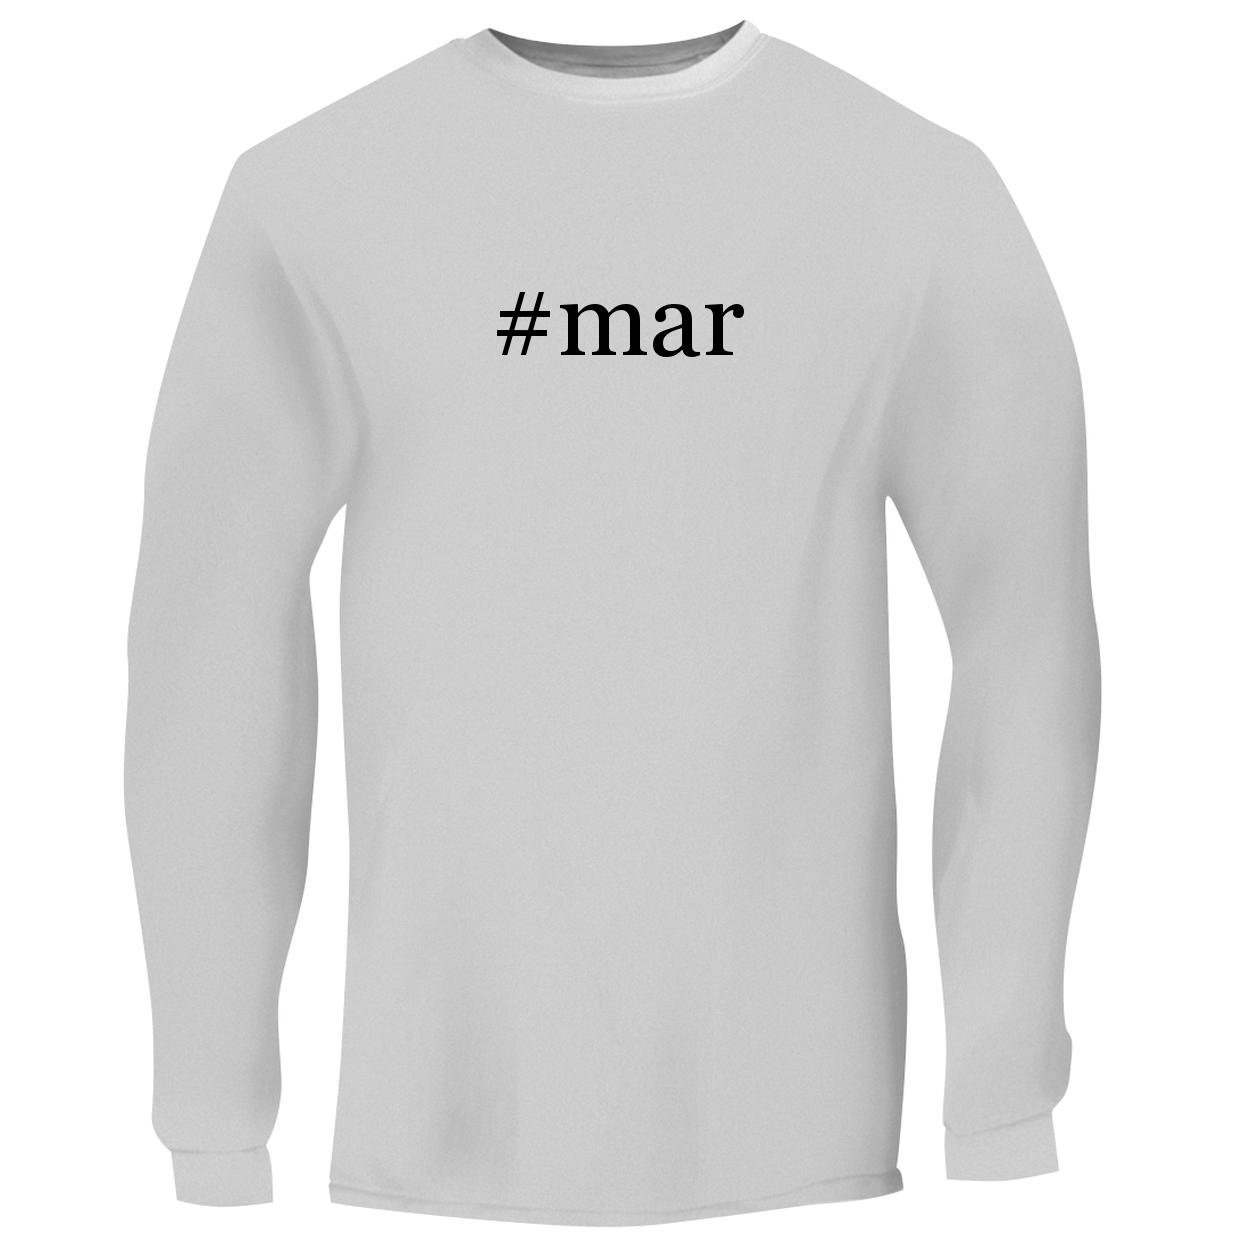 Mar S Graphic Ts Shirts